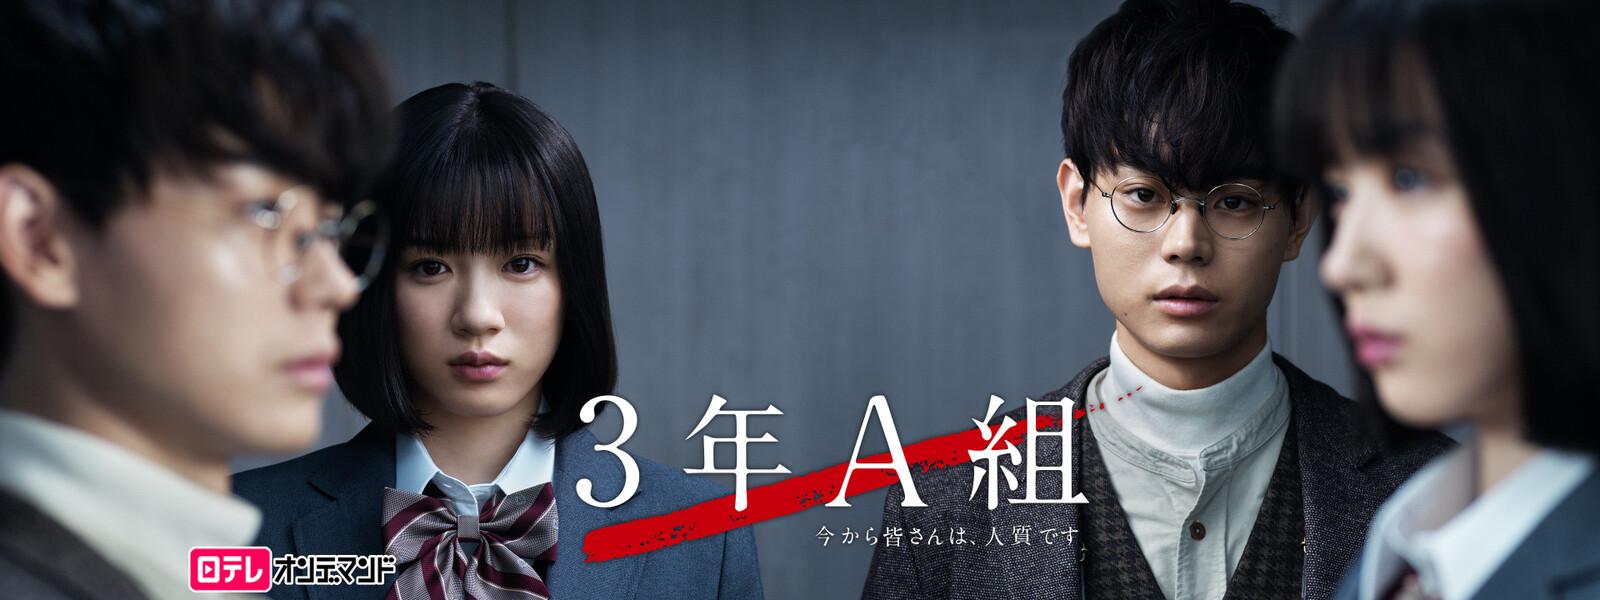 3 Nen A Gumi - Episode01-10 [COMPLETE] - Bagikuy!